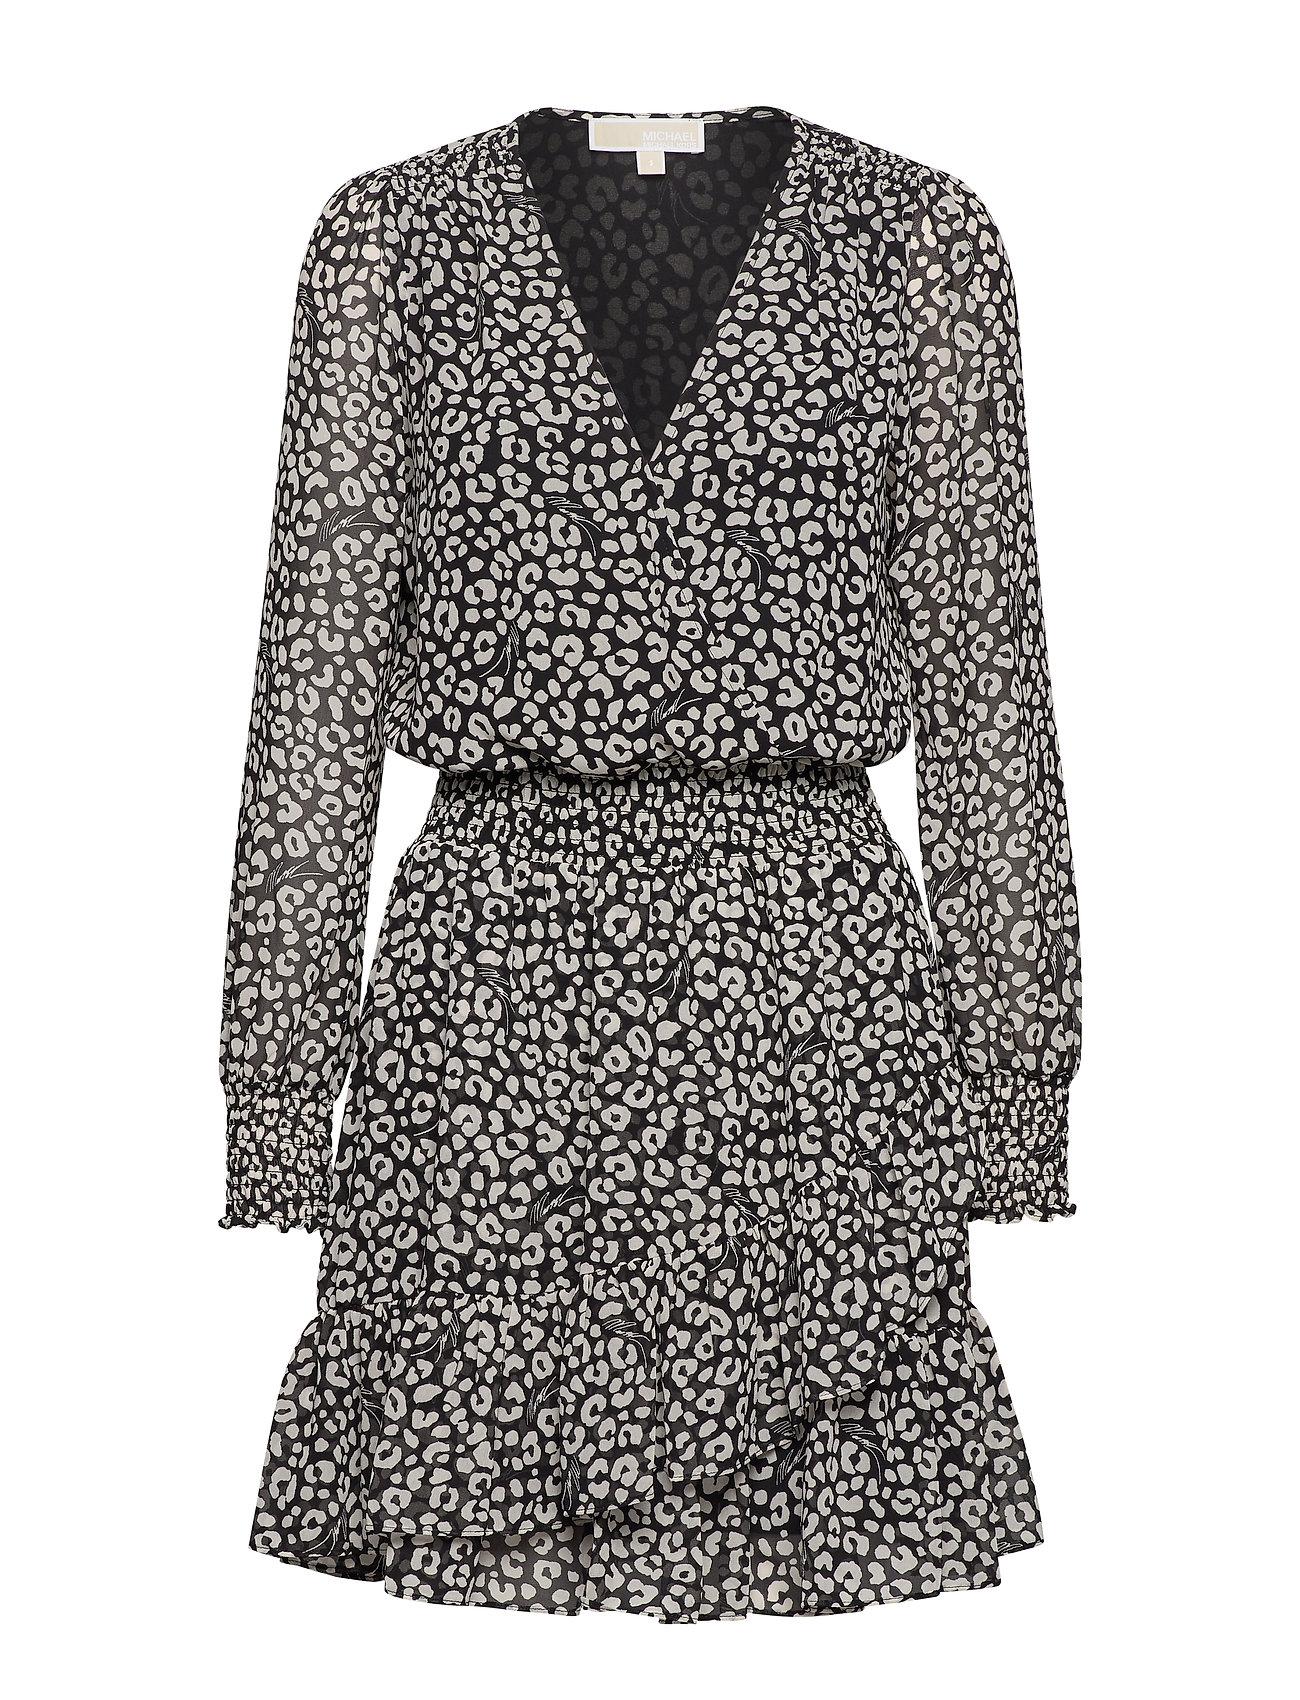 Michael Kors RUFFLE WRAP DRESS - BLACK/BONE